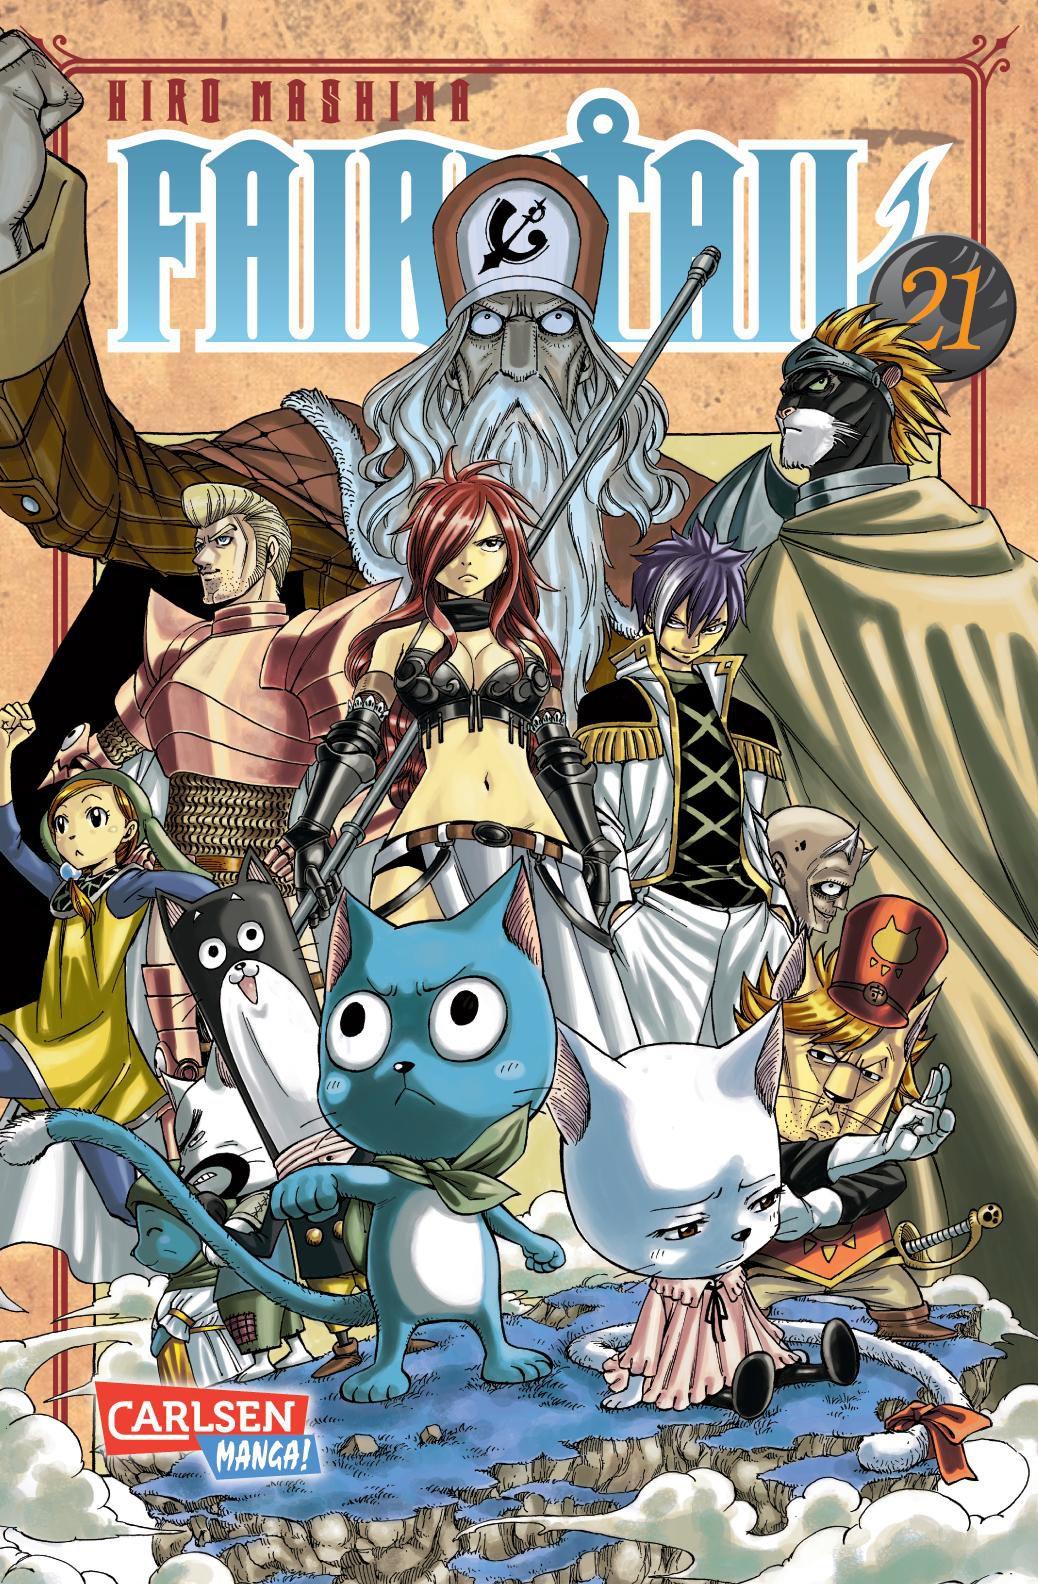 NEU Fairy Tail 21 Hiro Mashima 796318